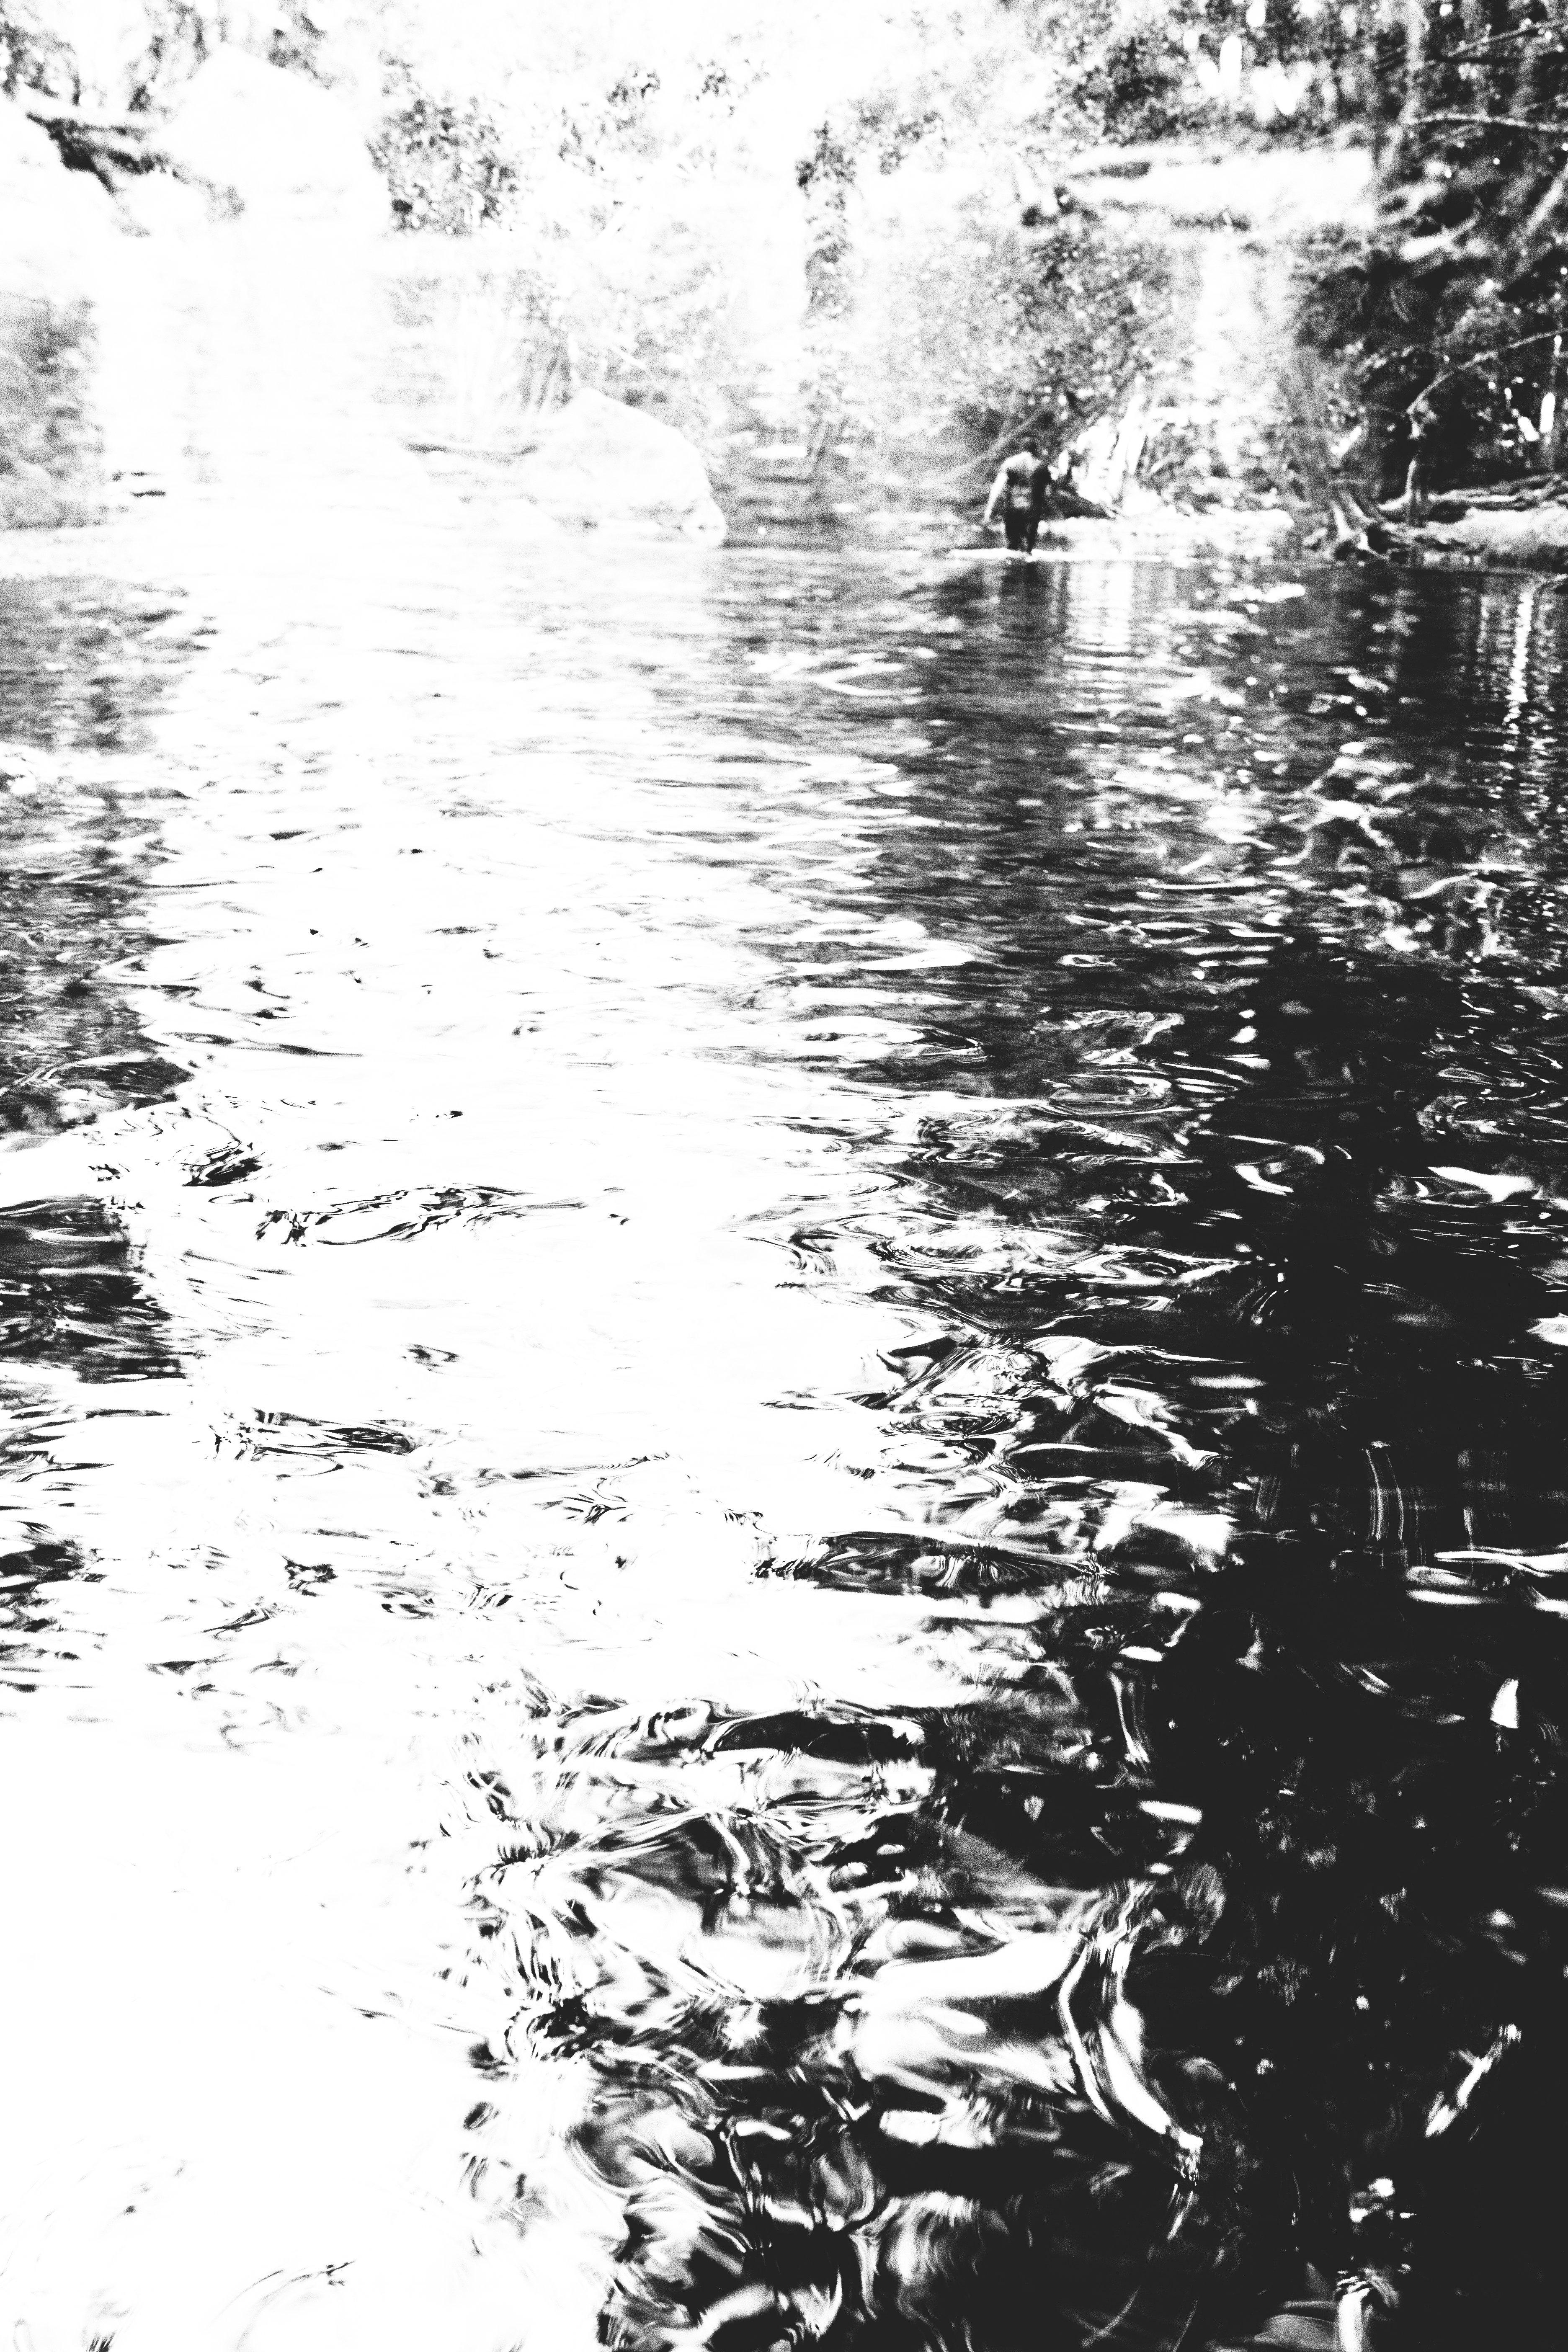 """The Waider"" by Joe McDermott, 24"" x 26"" Photograph,9/27/2013, Mud Season Review"